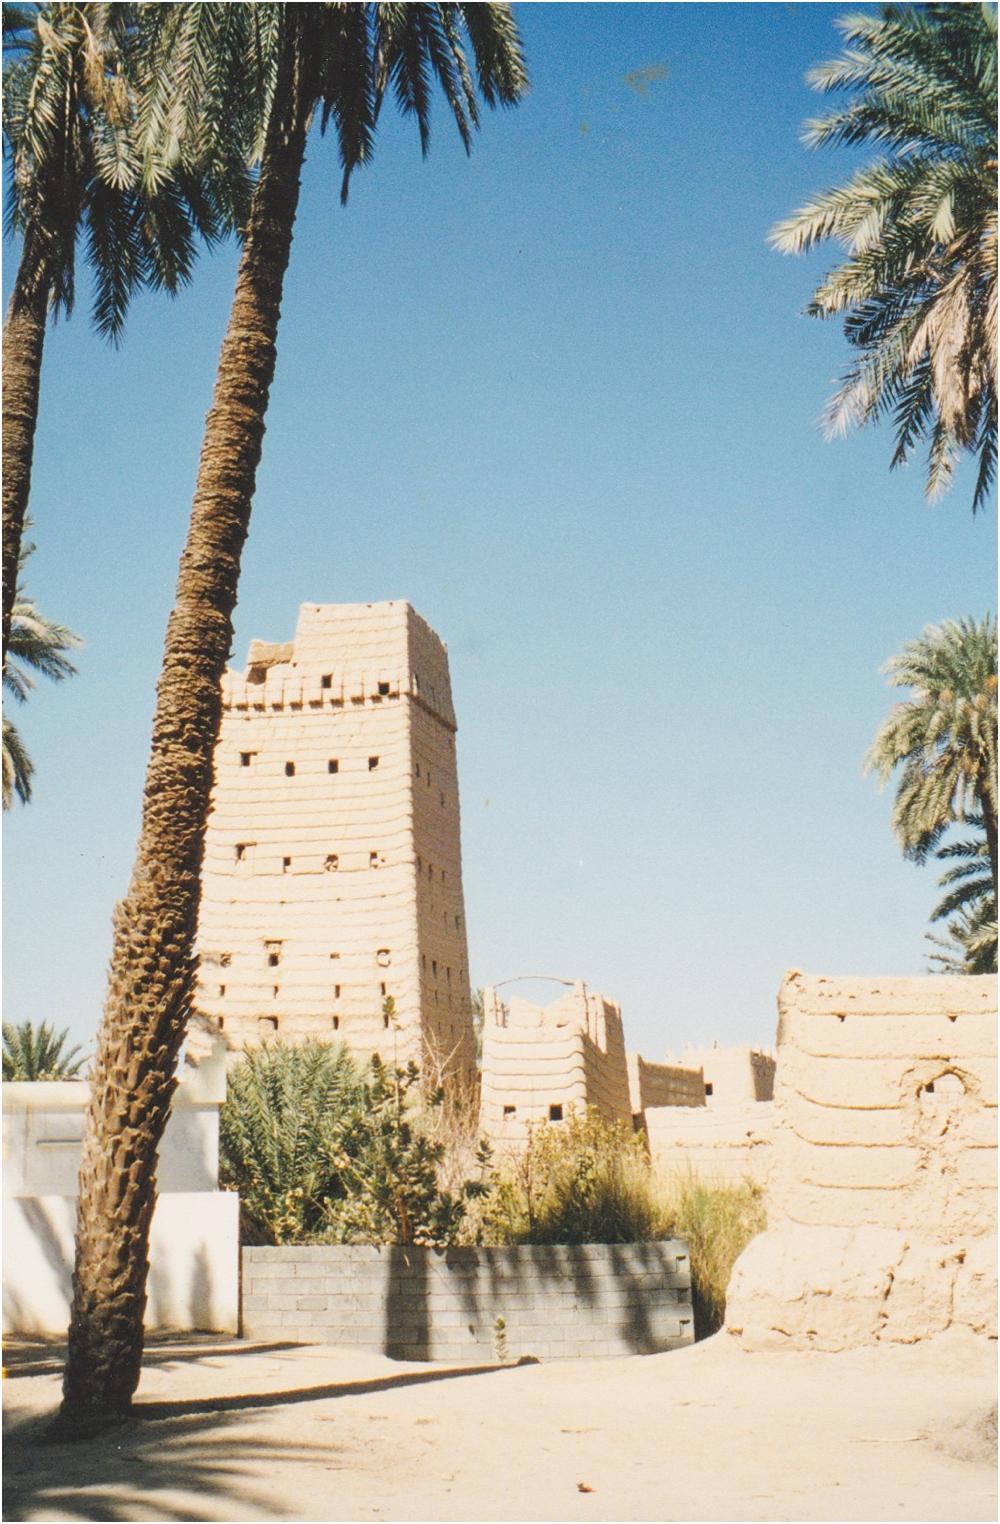 Najran, Saudi Arabia village I visited when I was 10!